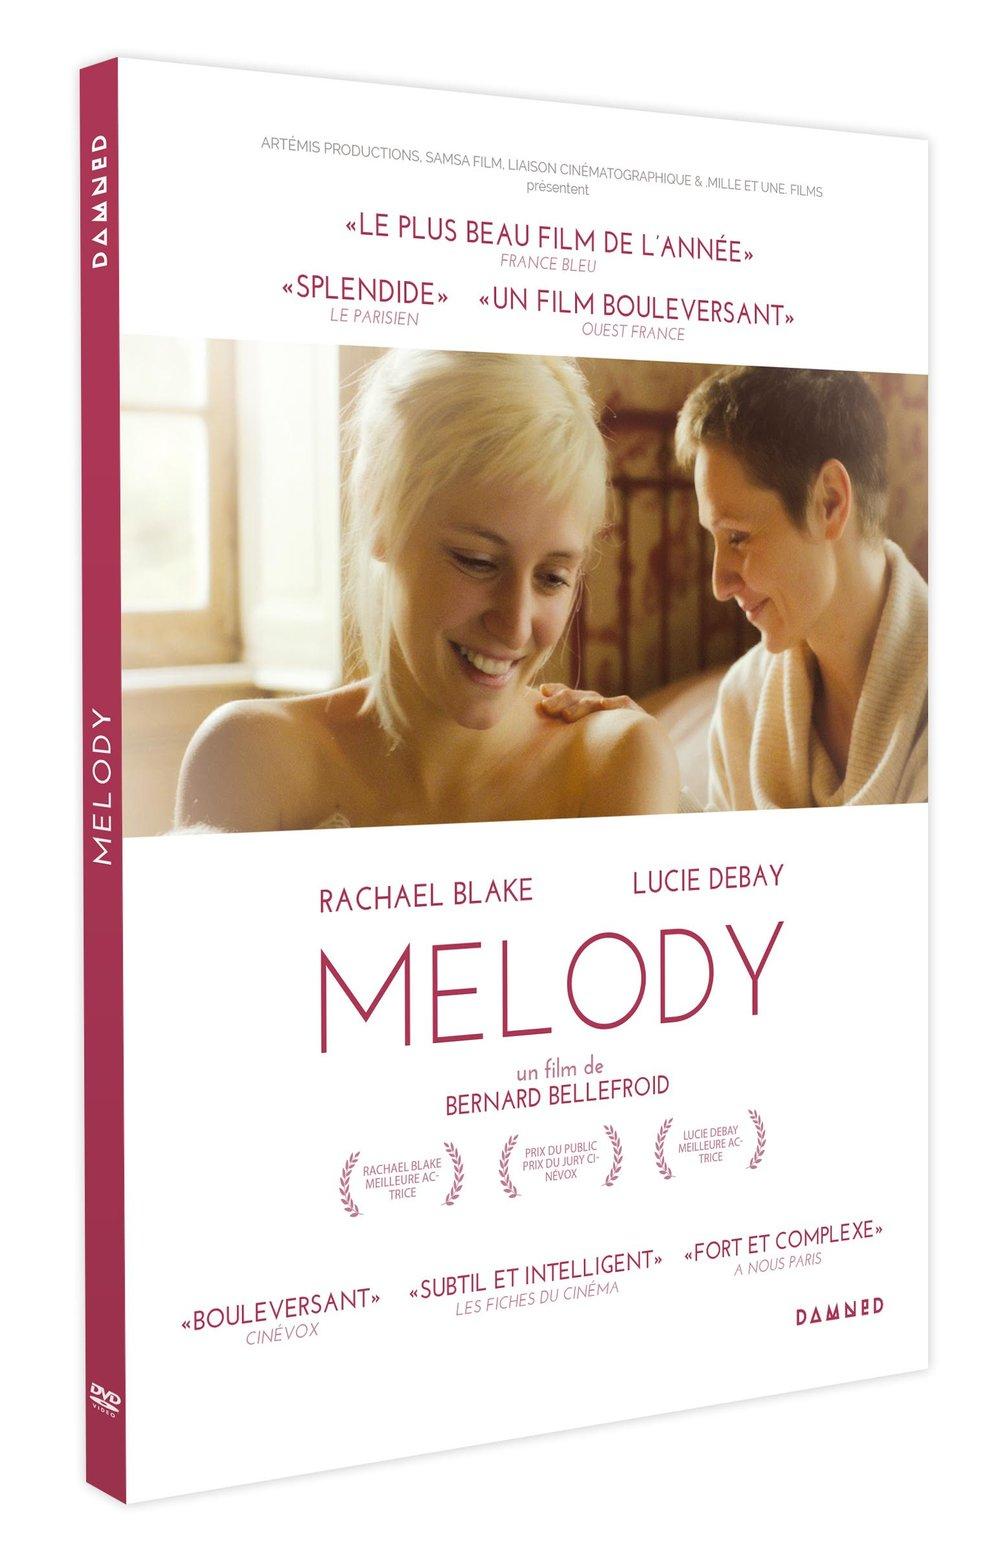 vignette DVD Melody.jpg